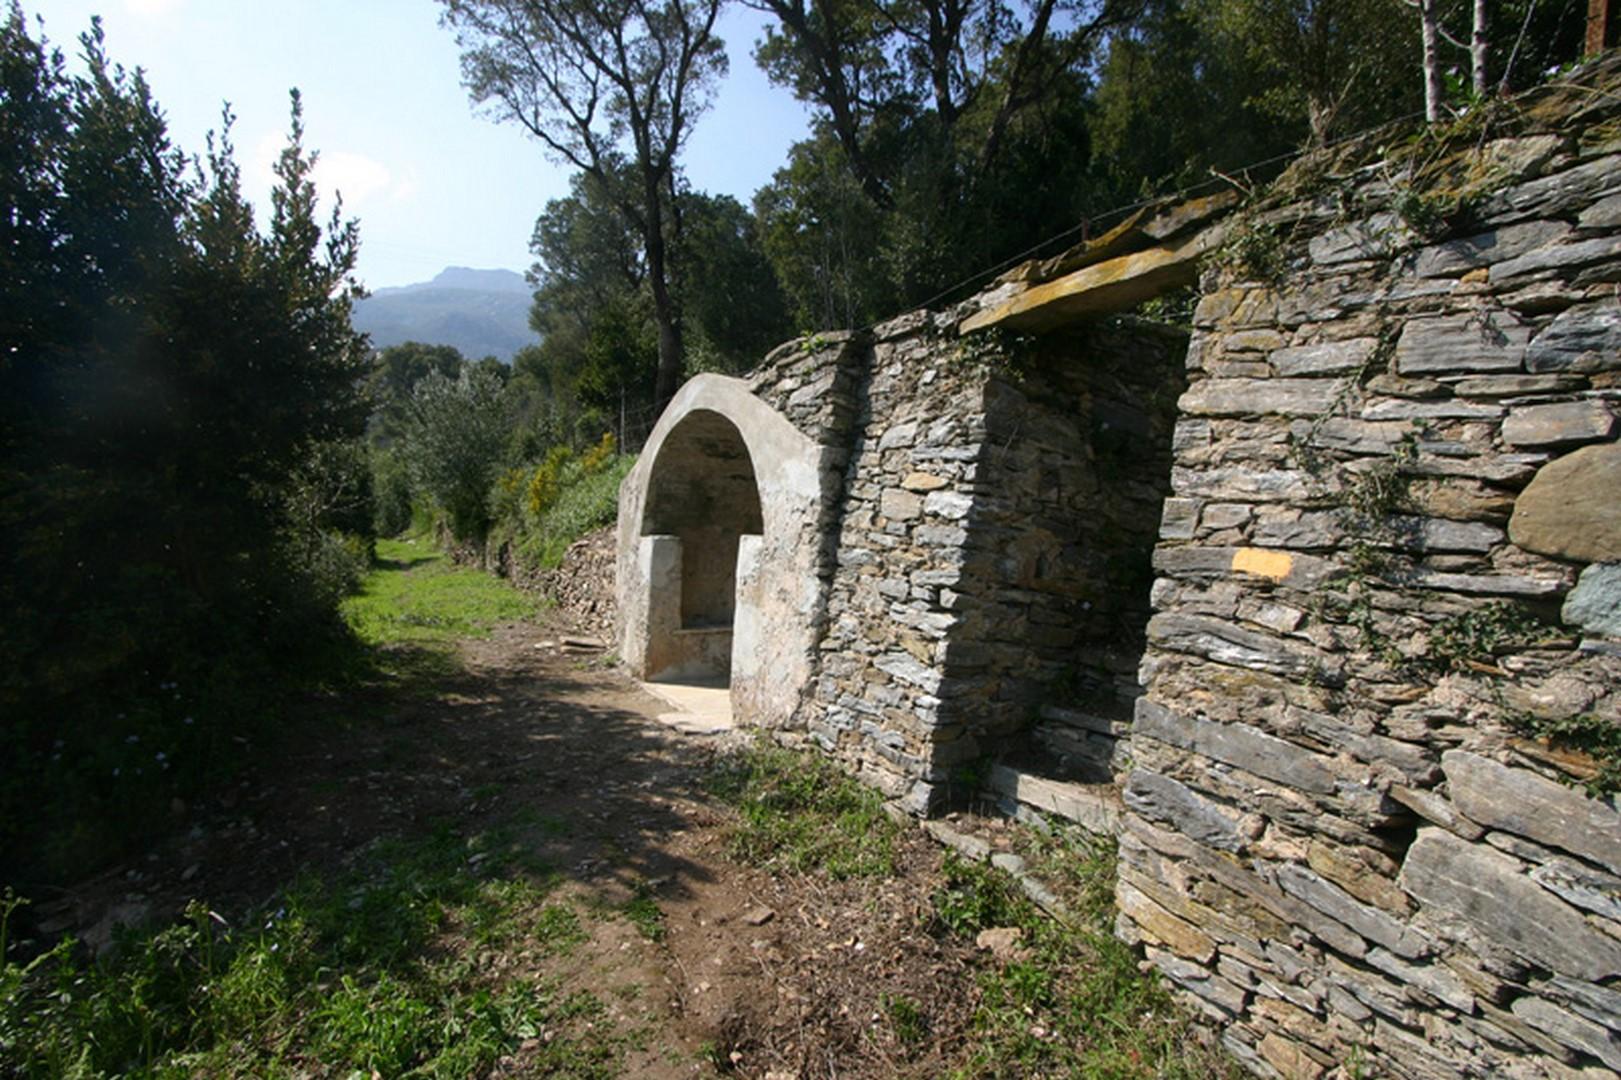 restauration-fontaine-lavoir-pierre-funtanella-pietra-corbara